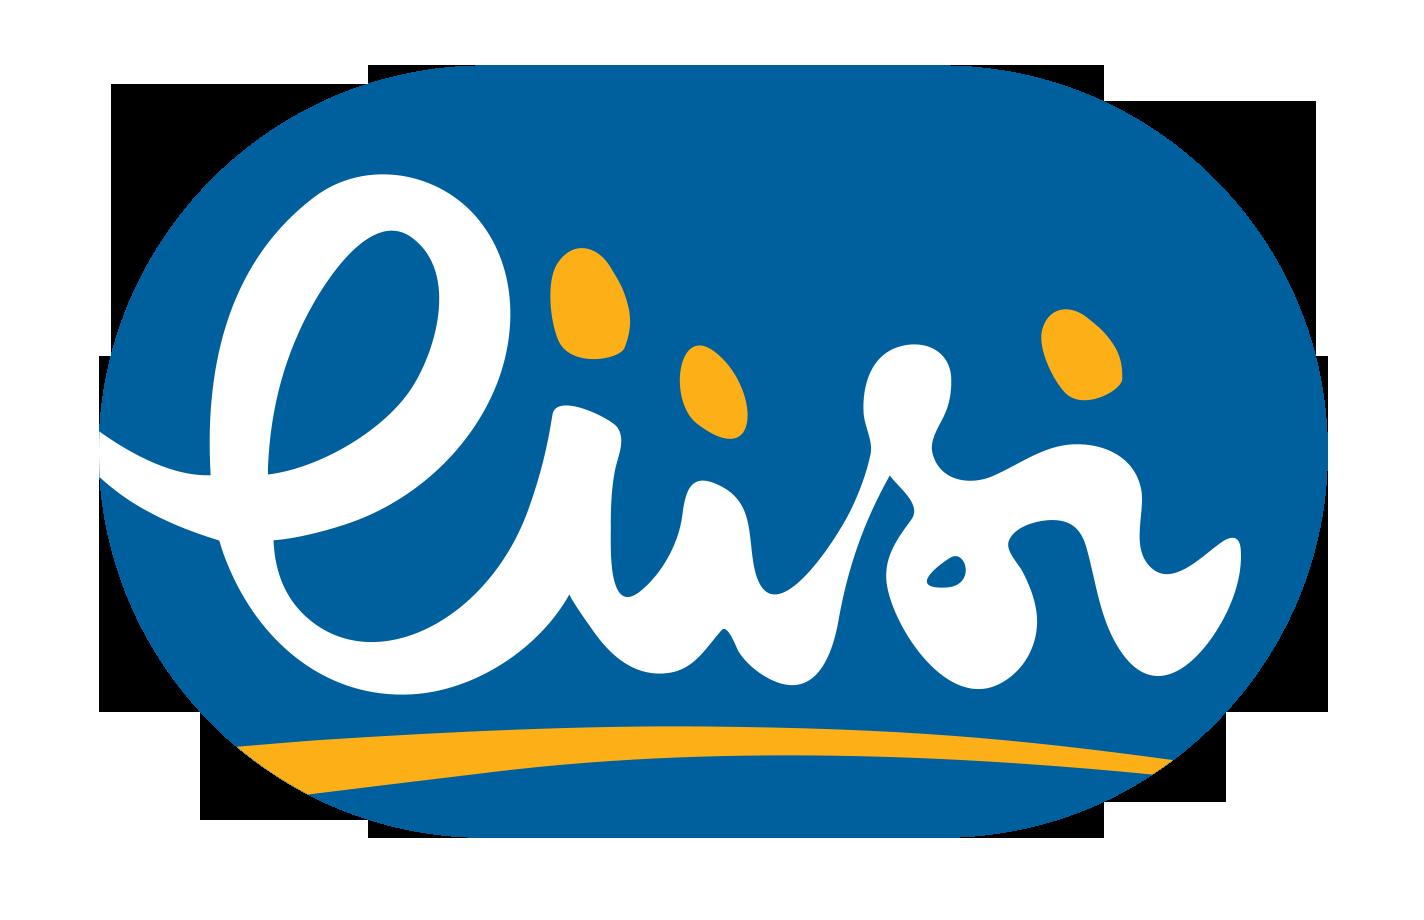 Liisi-järelmaksu-logo-sinine